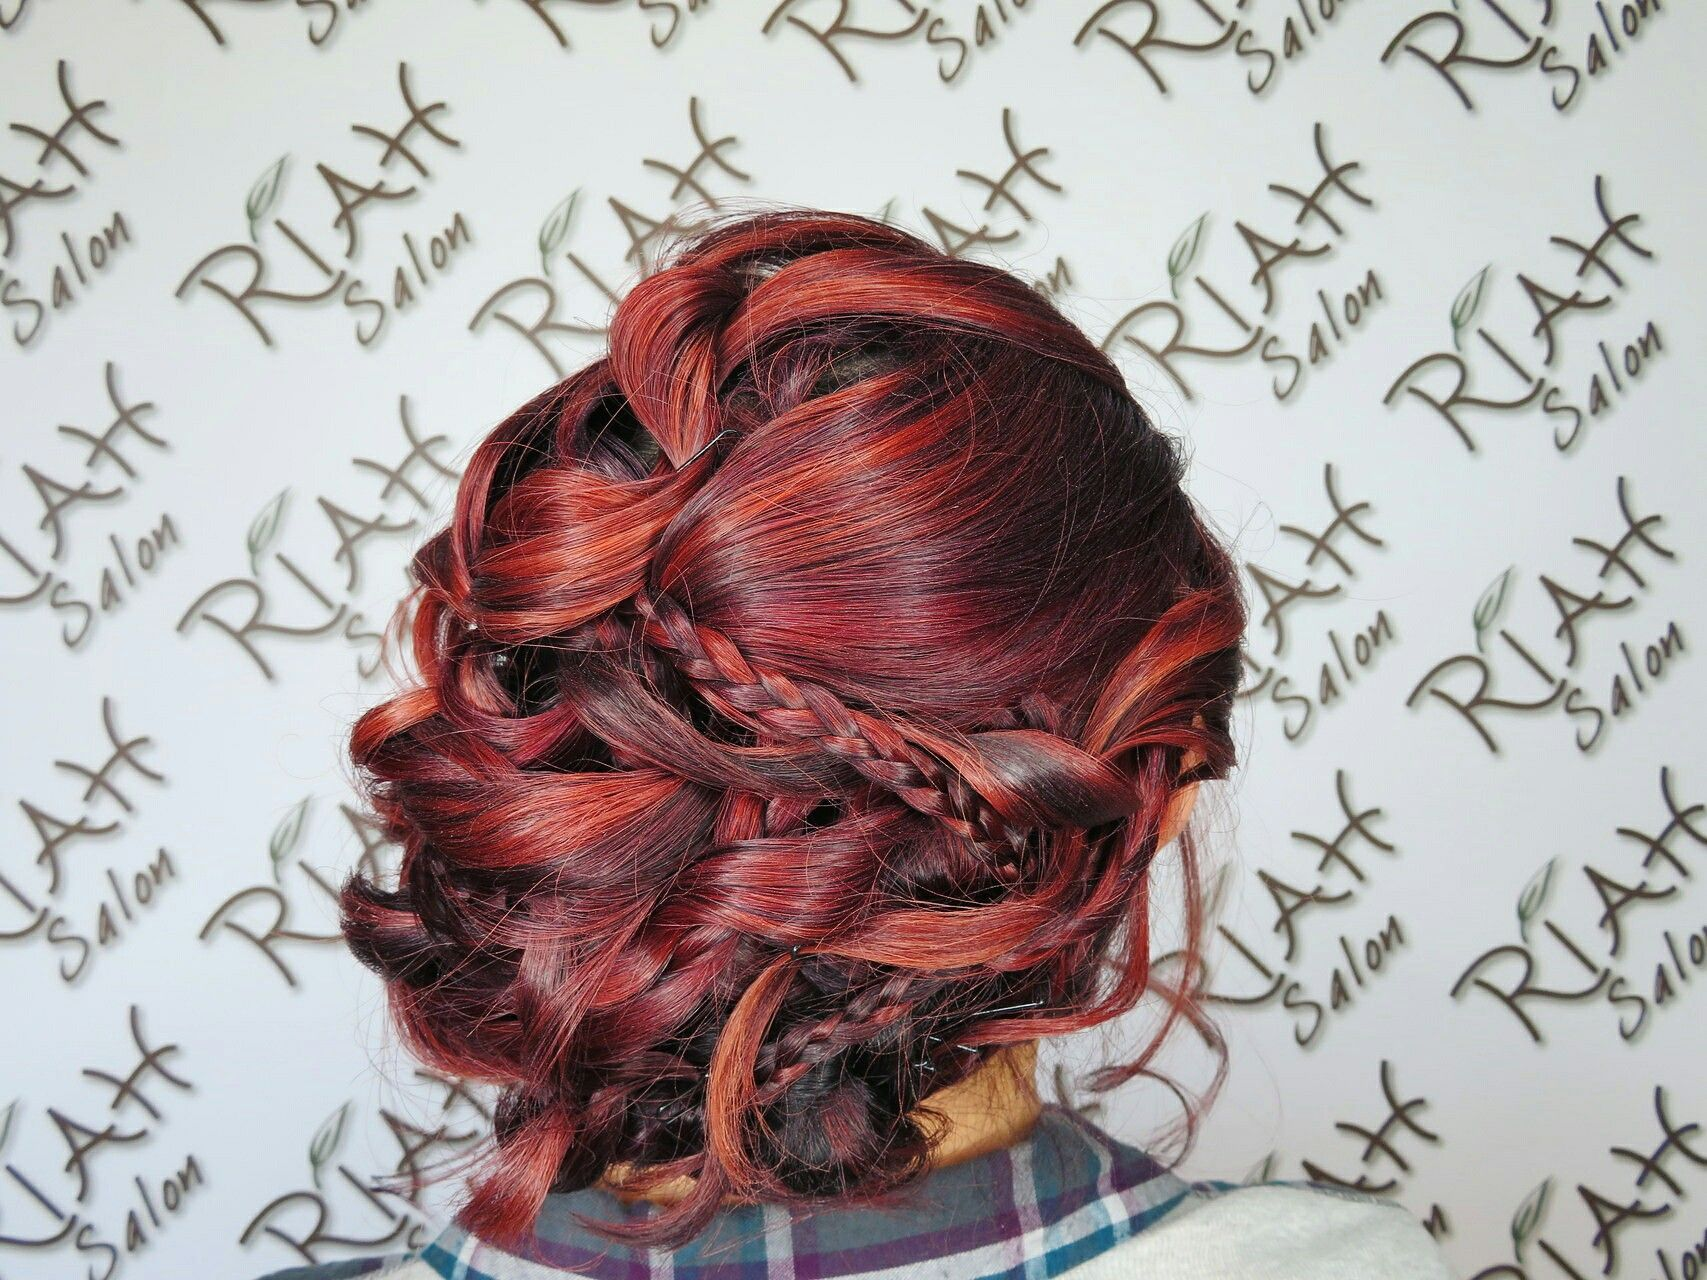 Riahsalon formal formalstyle dancintime braid updo curls